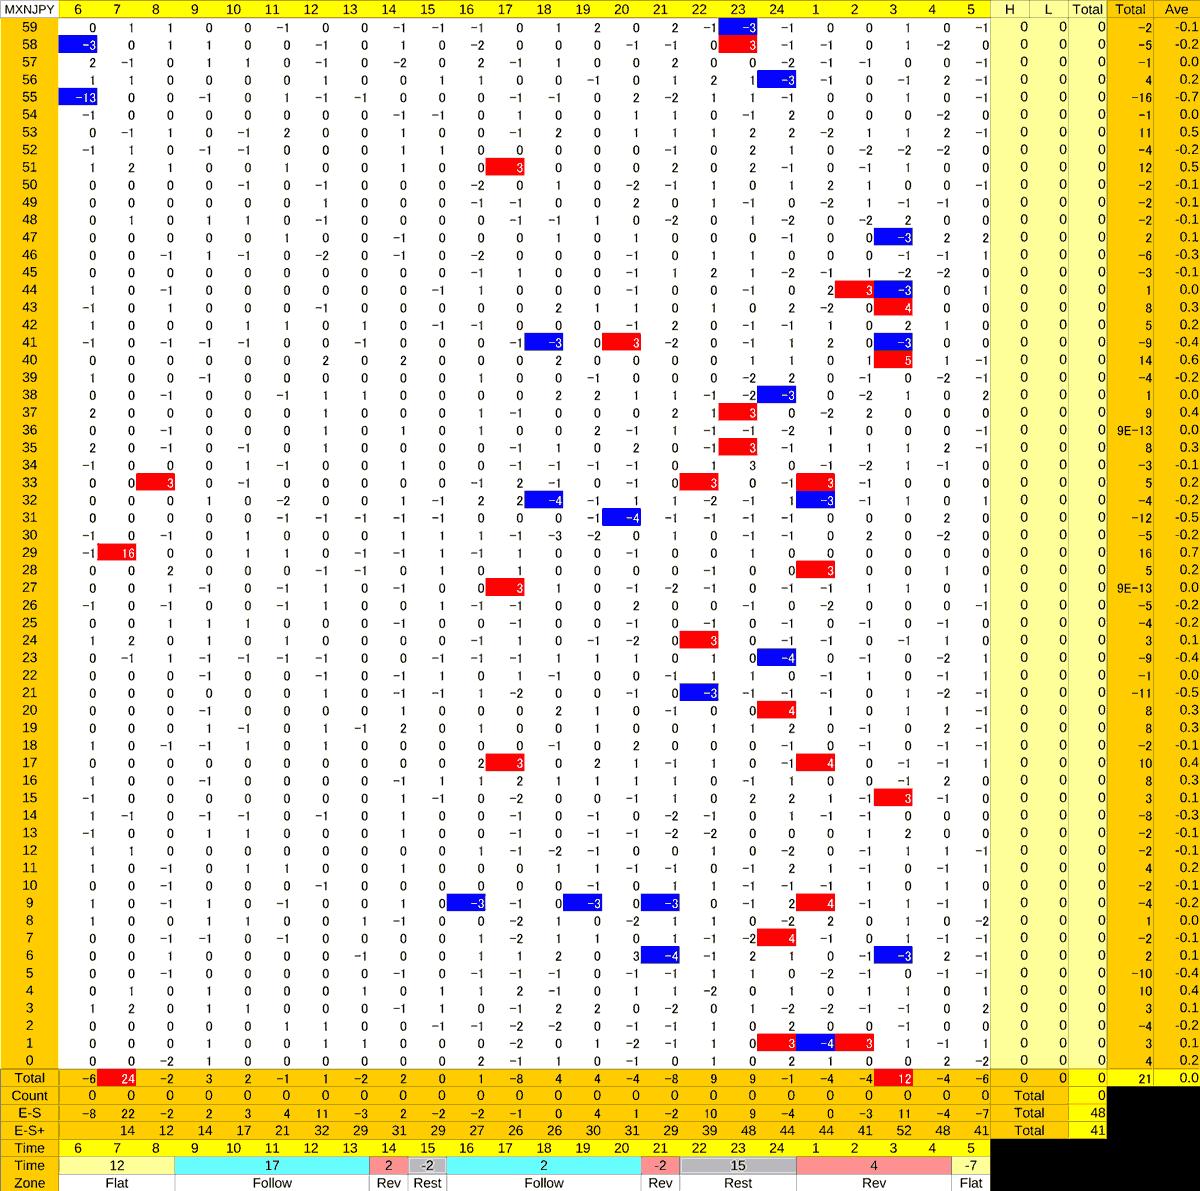 20201201_HS(3)MXNJPY